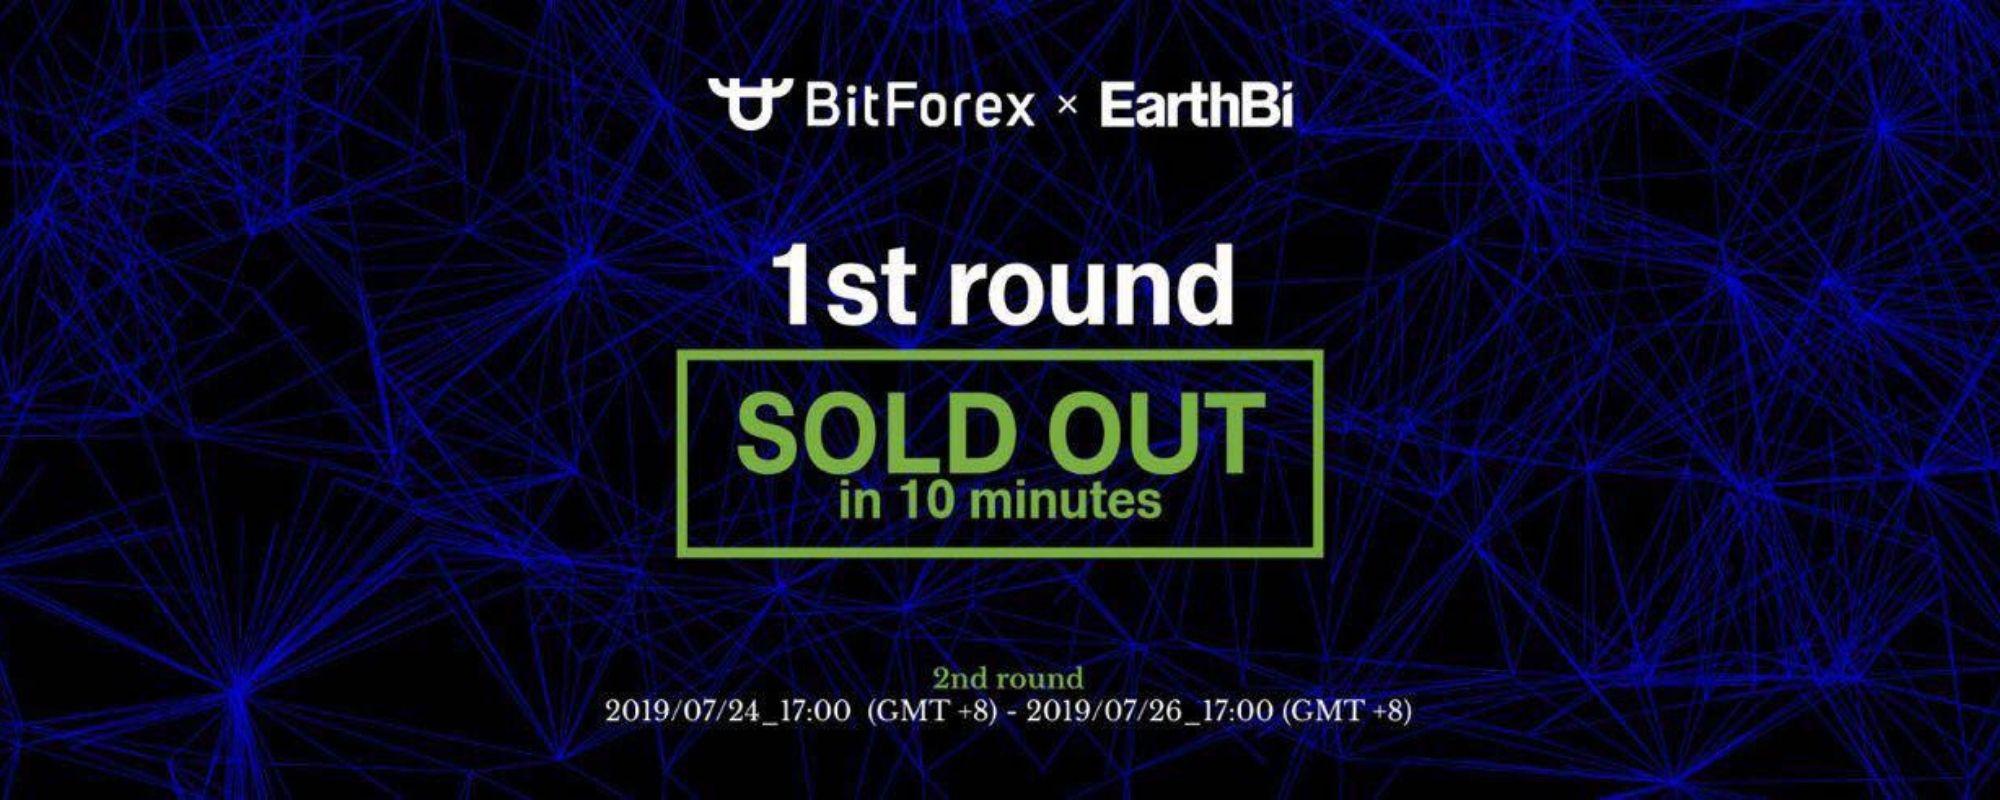 EarthBi IEO Bitforex first round